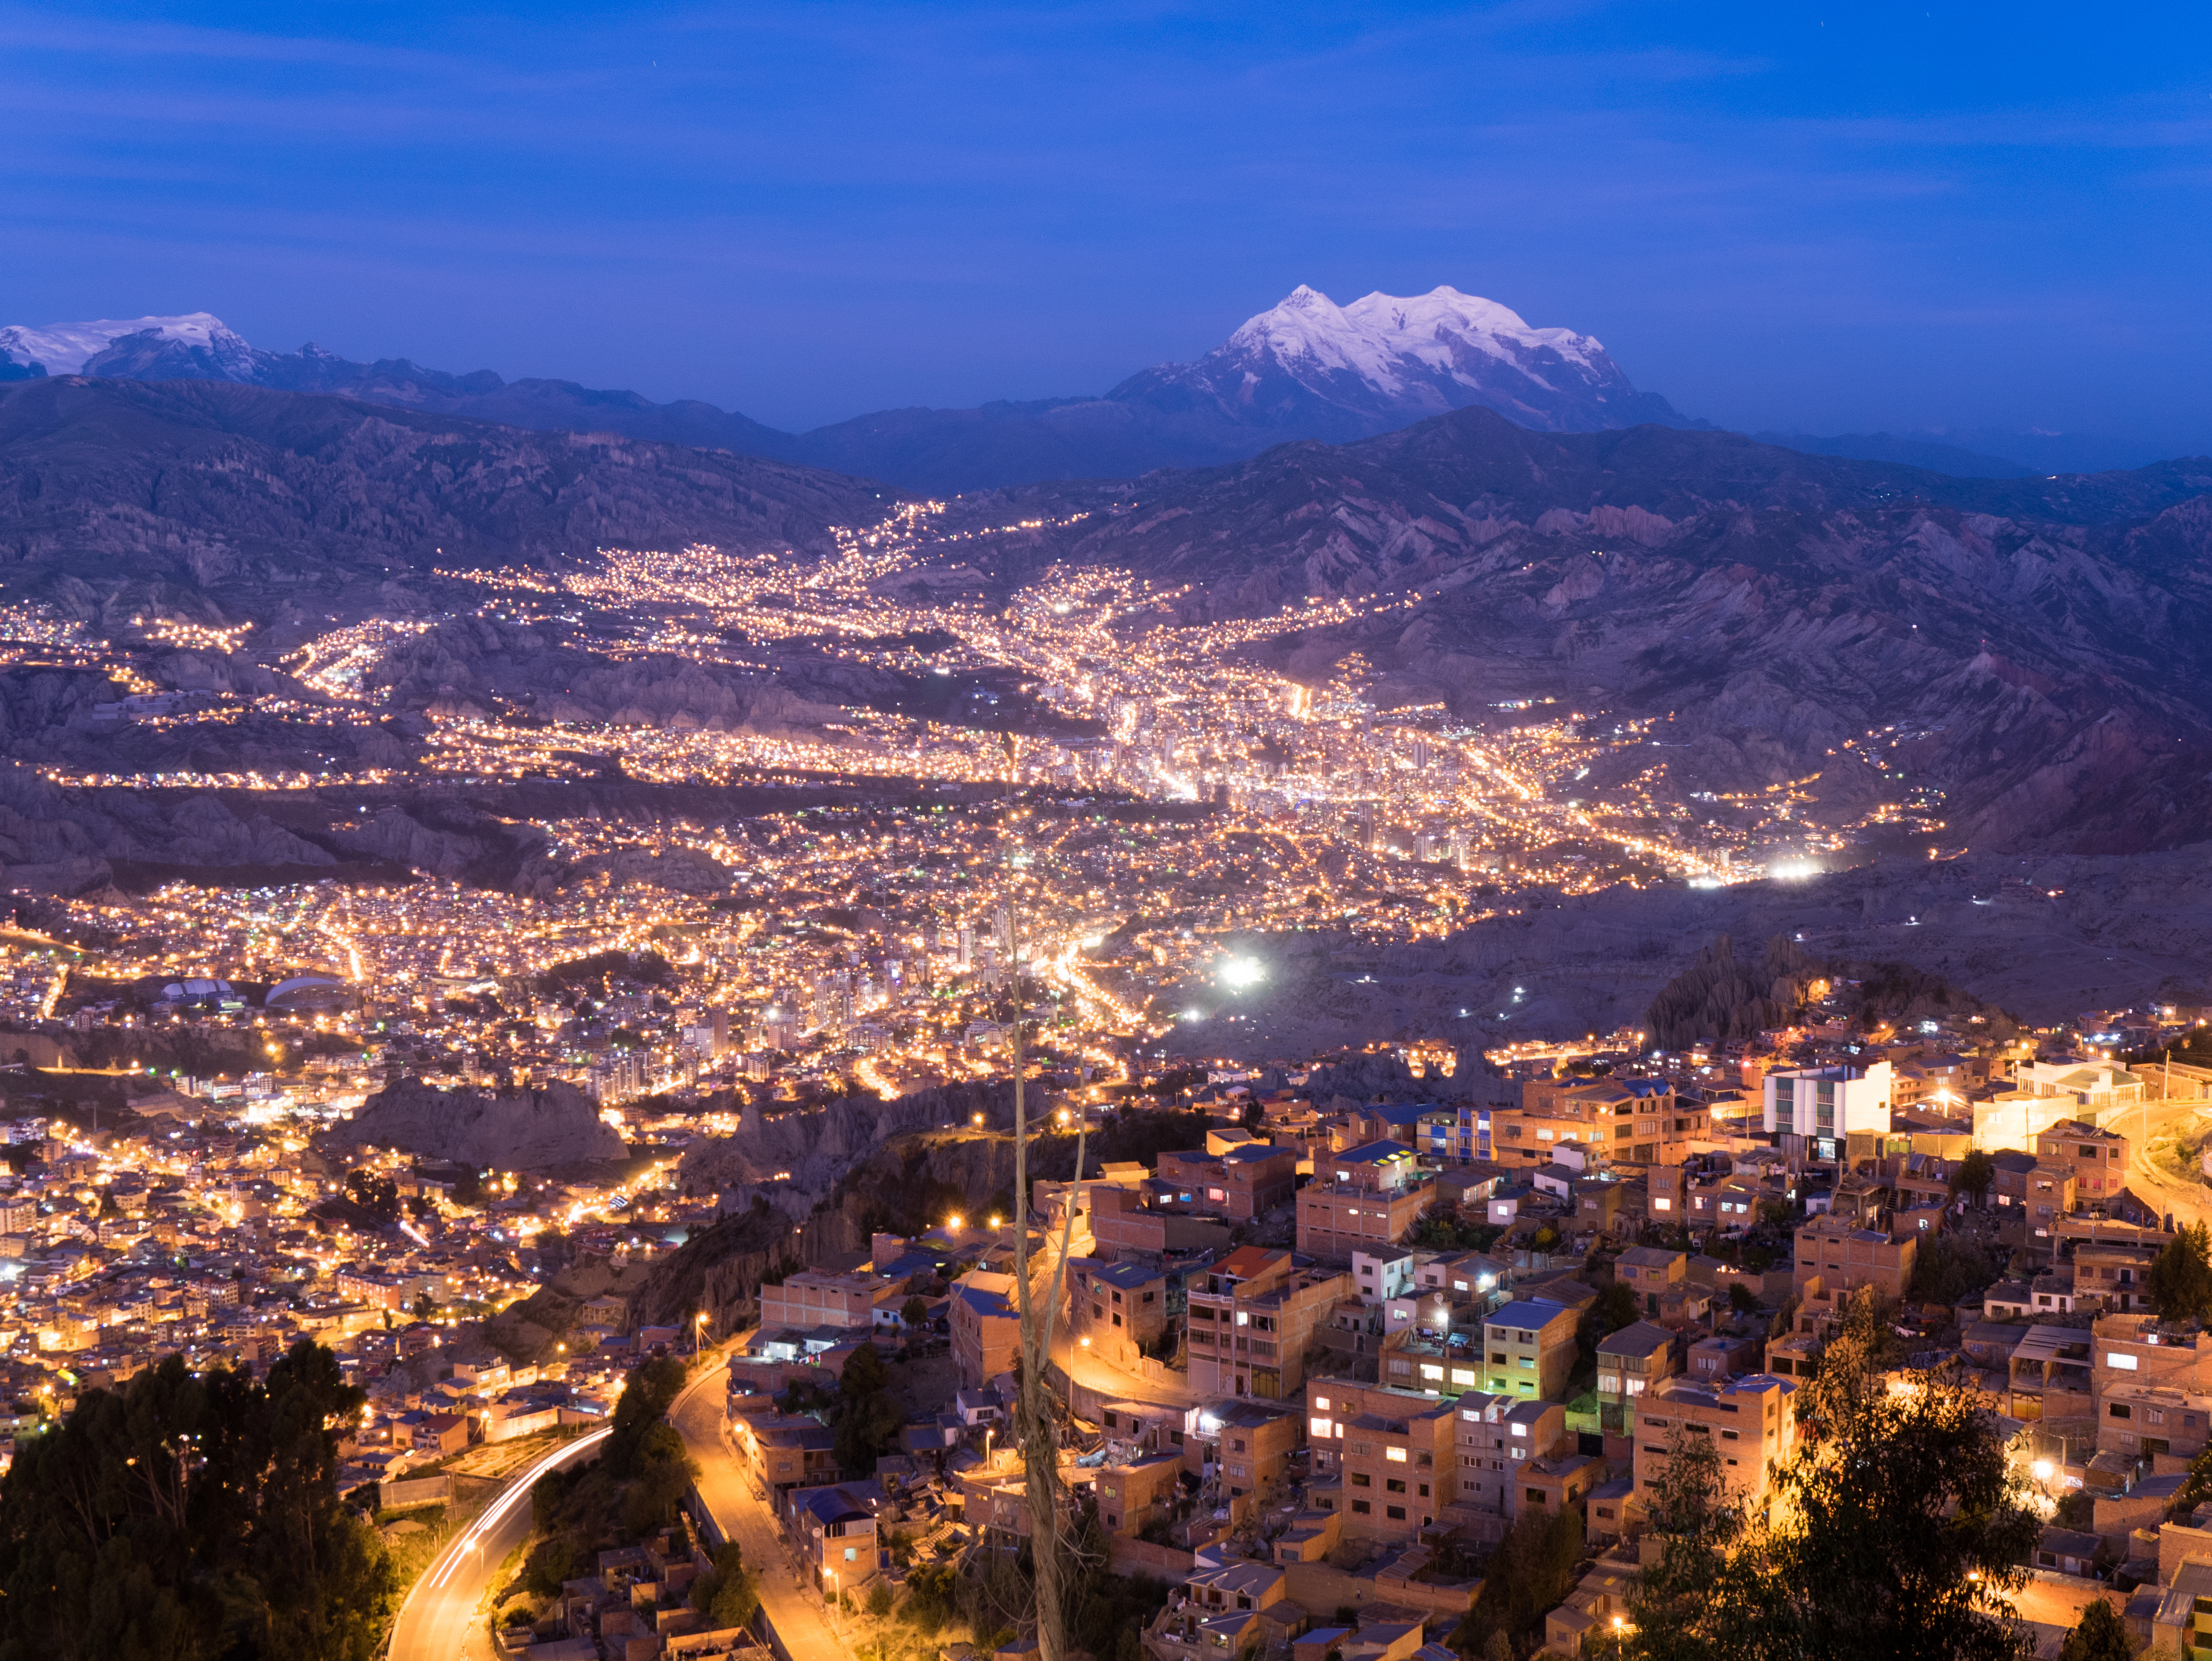 La Paz capital da Bolivia a noite com monte Ilimani ao fundo